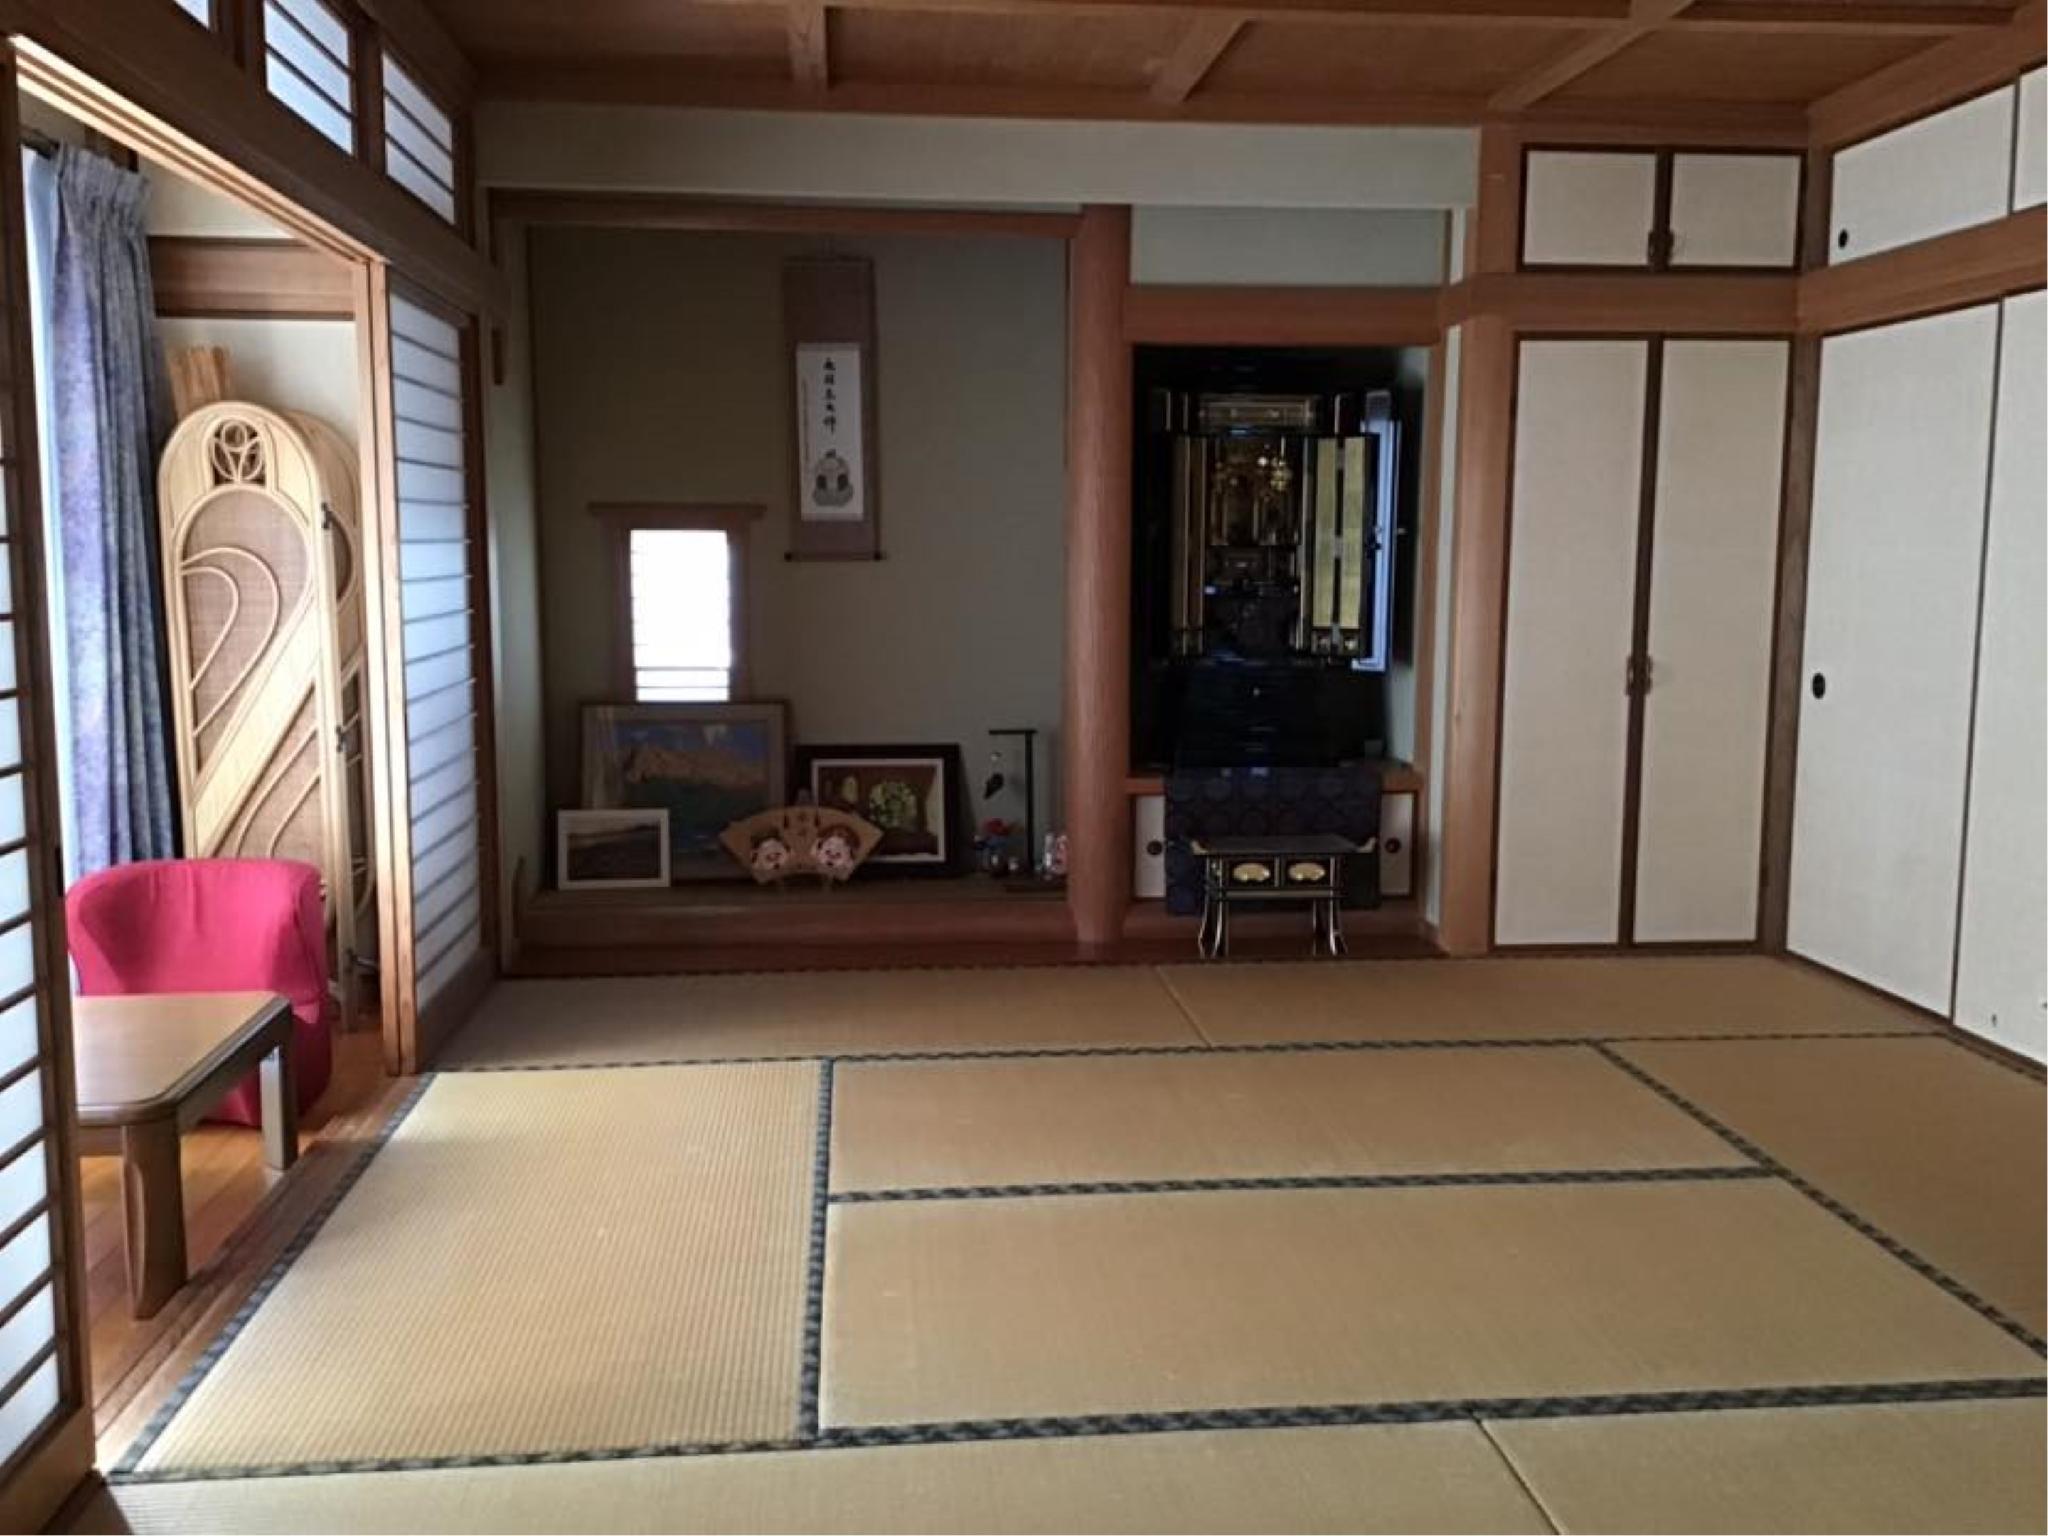 Wadatei, Izumi